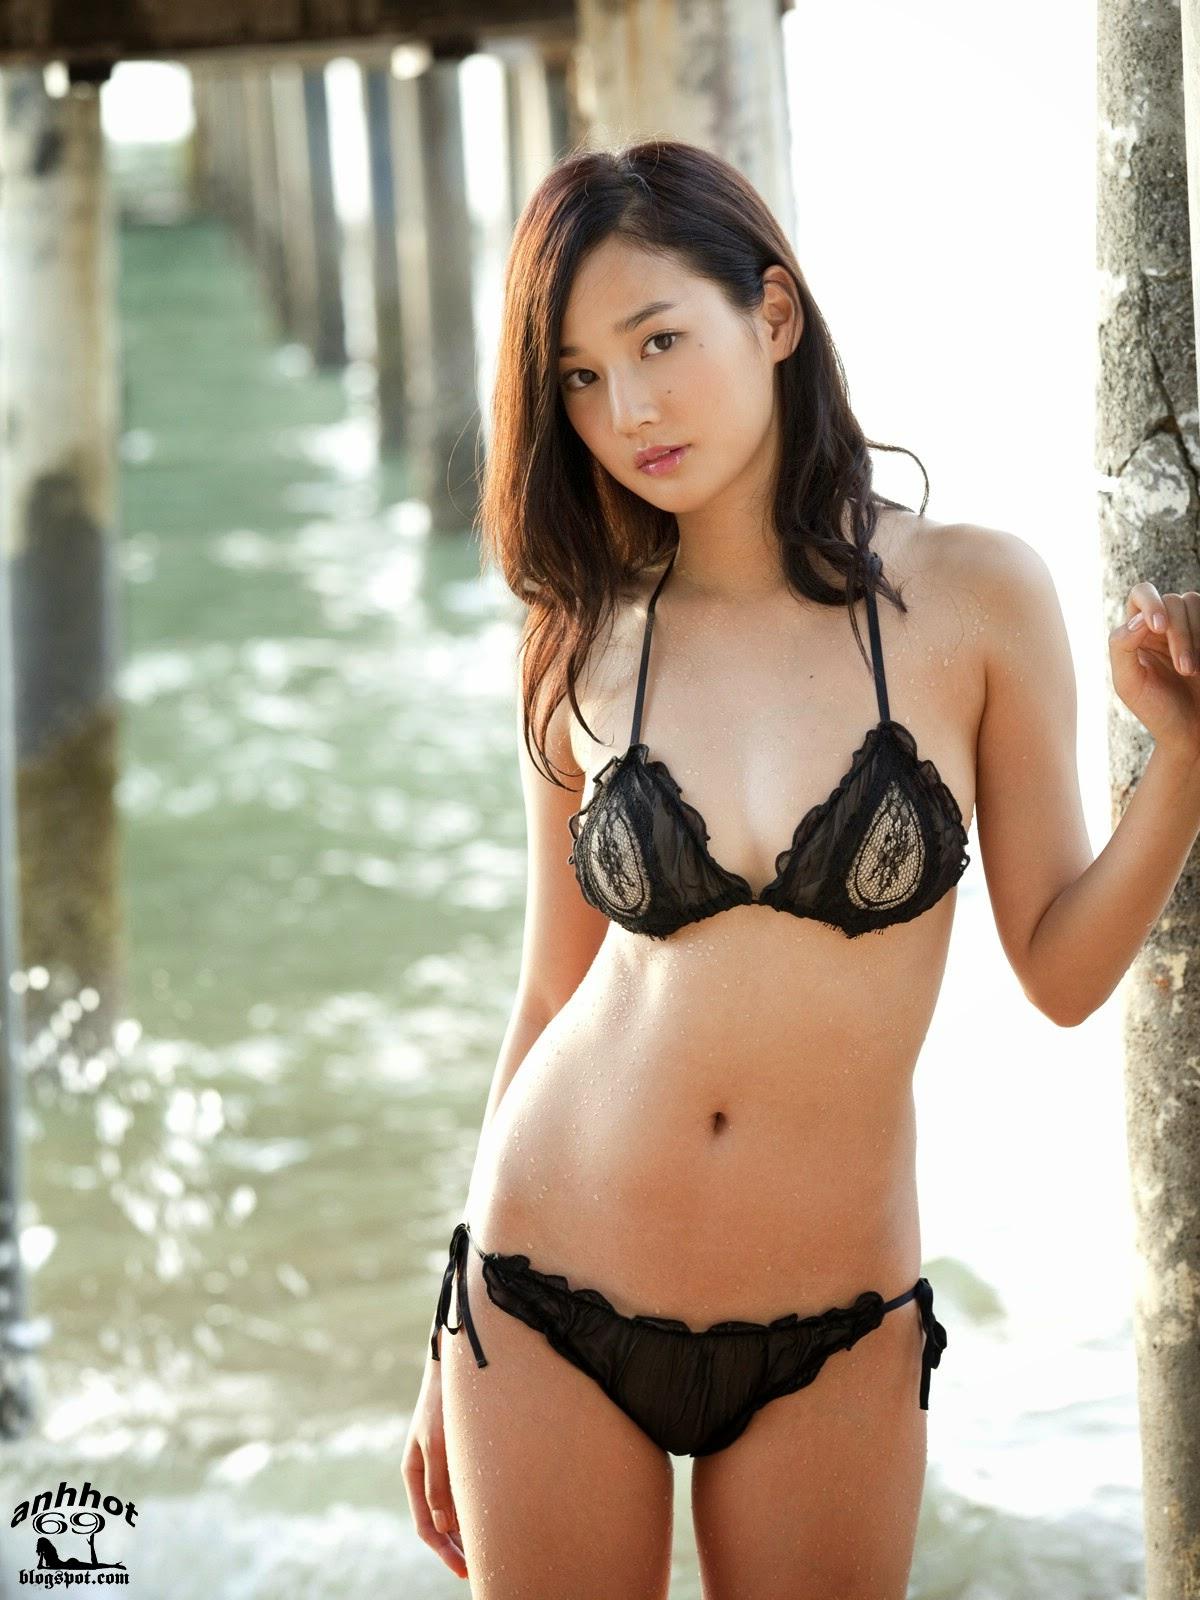 kaho-takashima-01205460